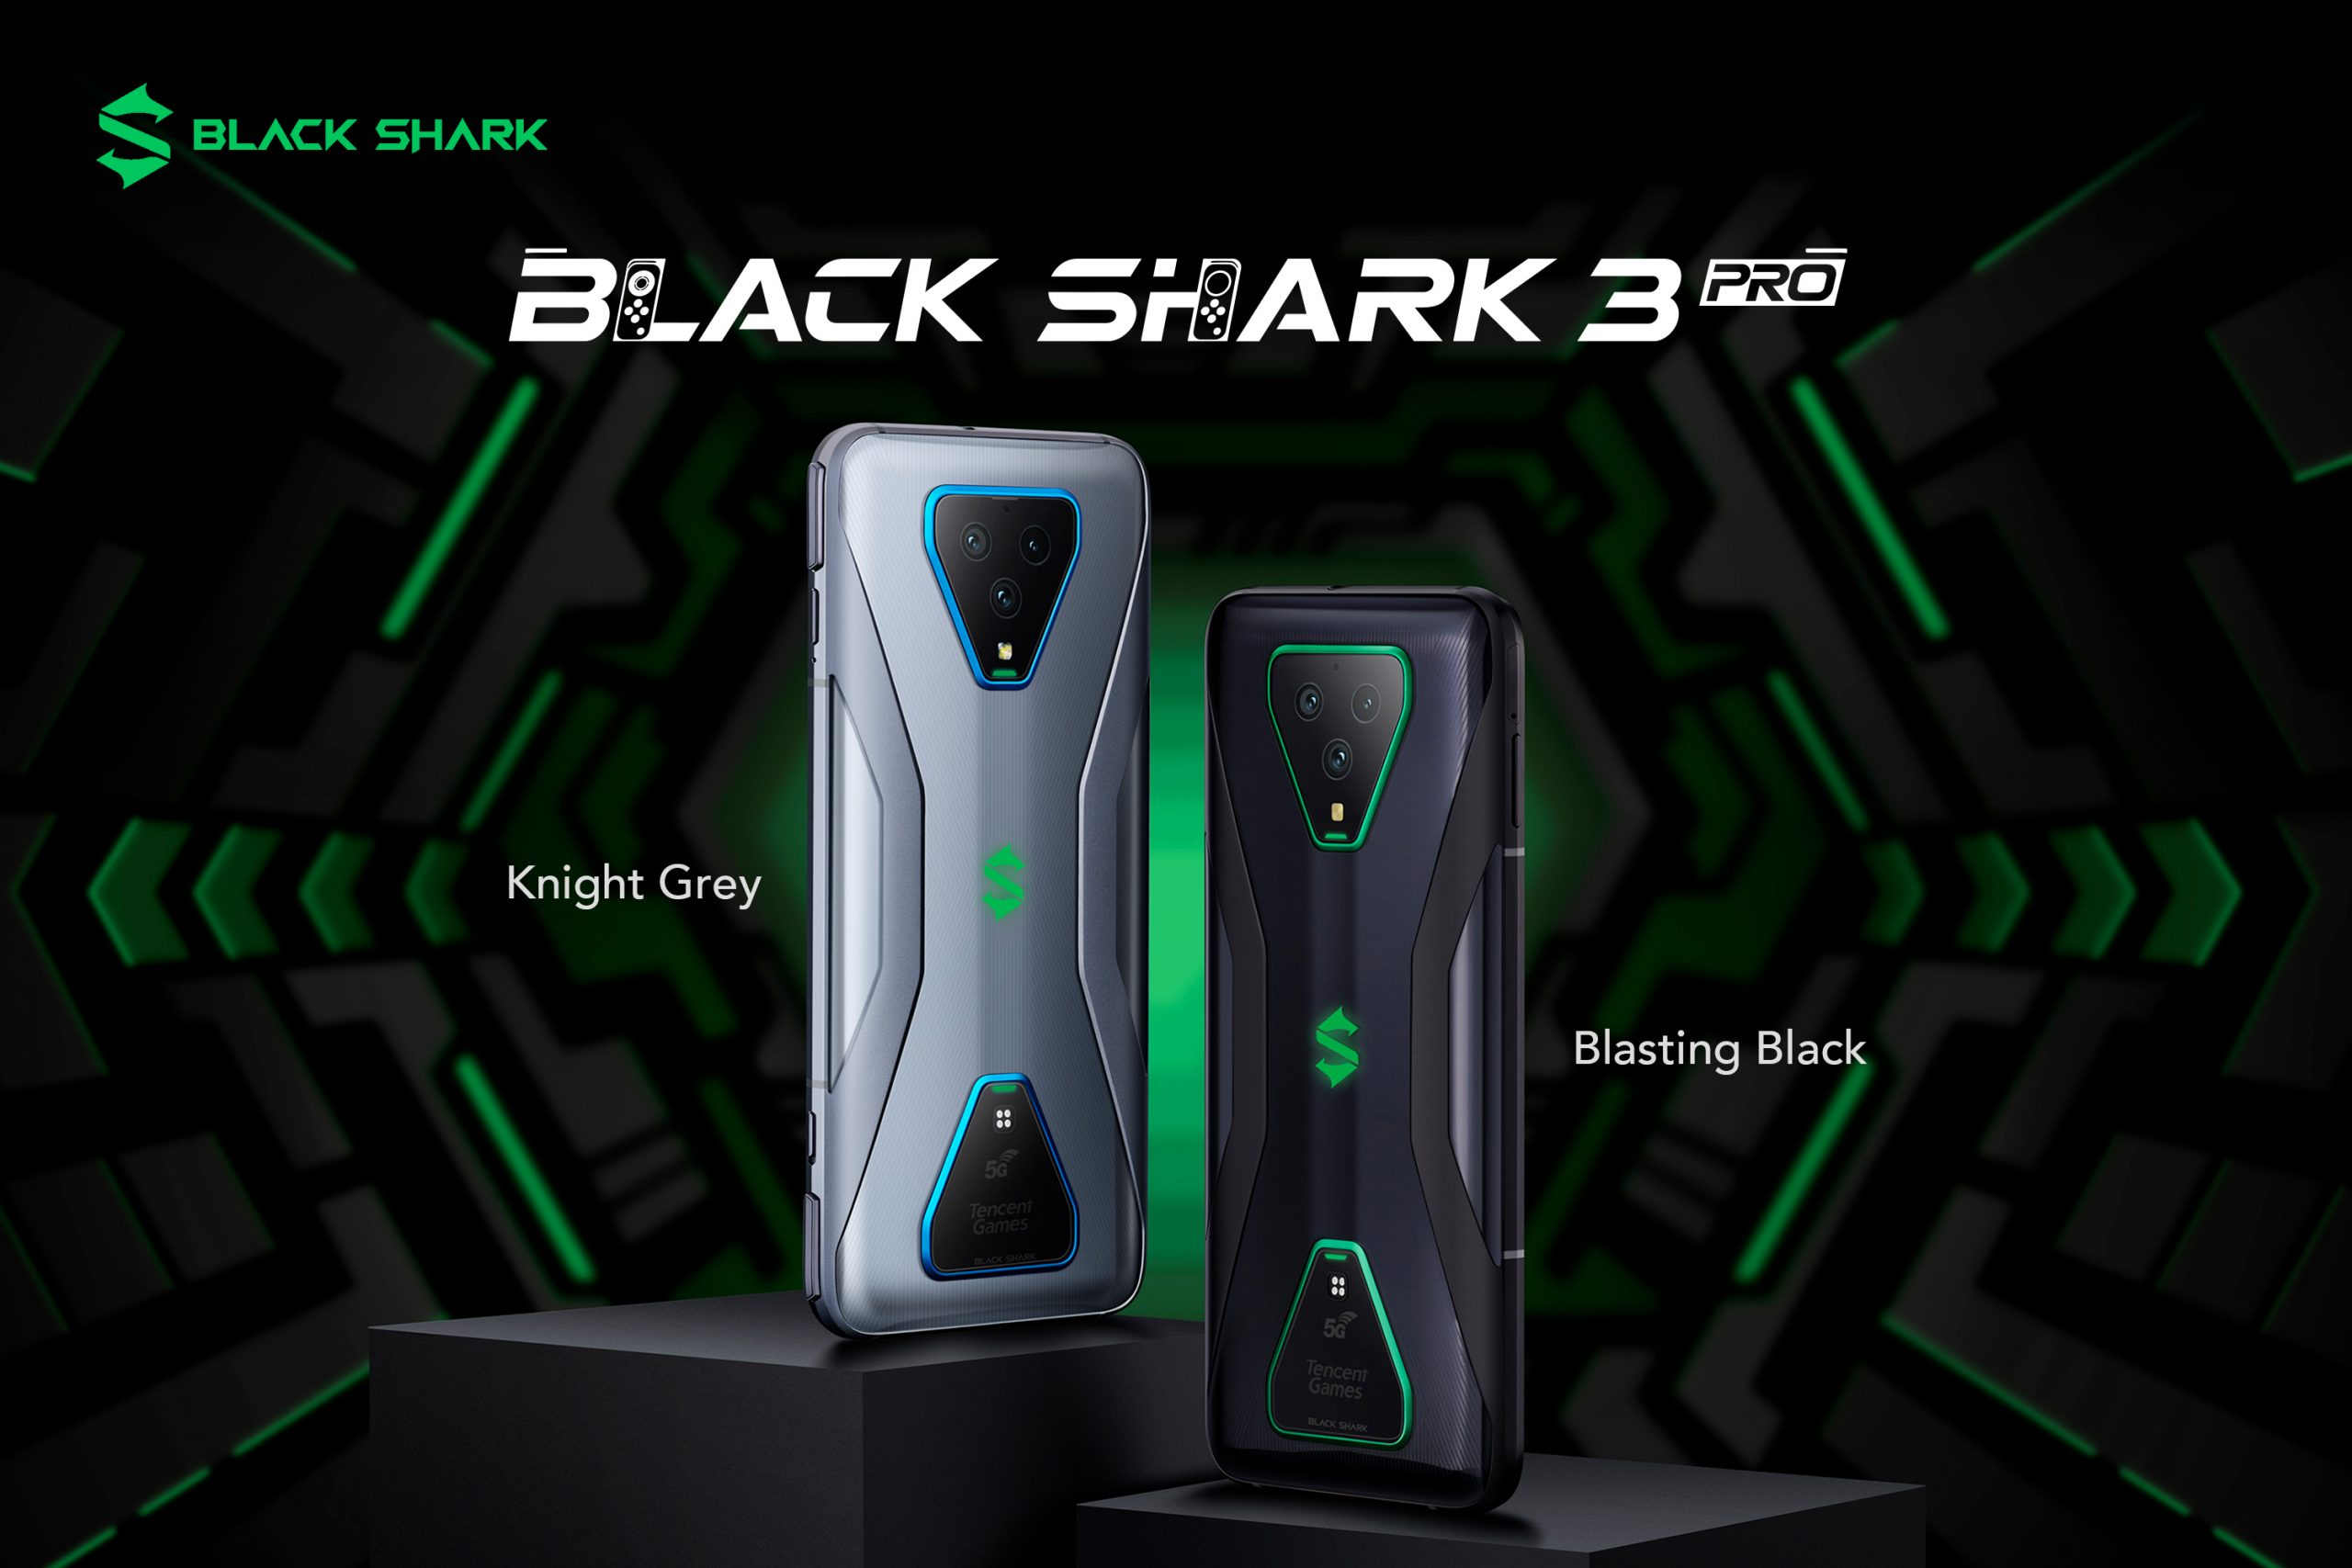 Black Shark 3 Pro (1)